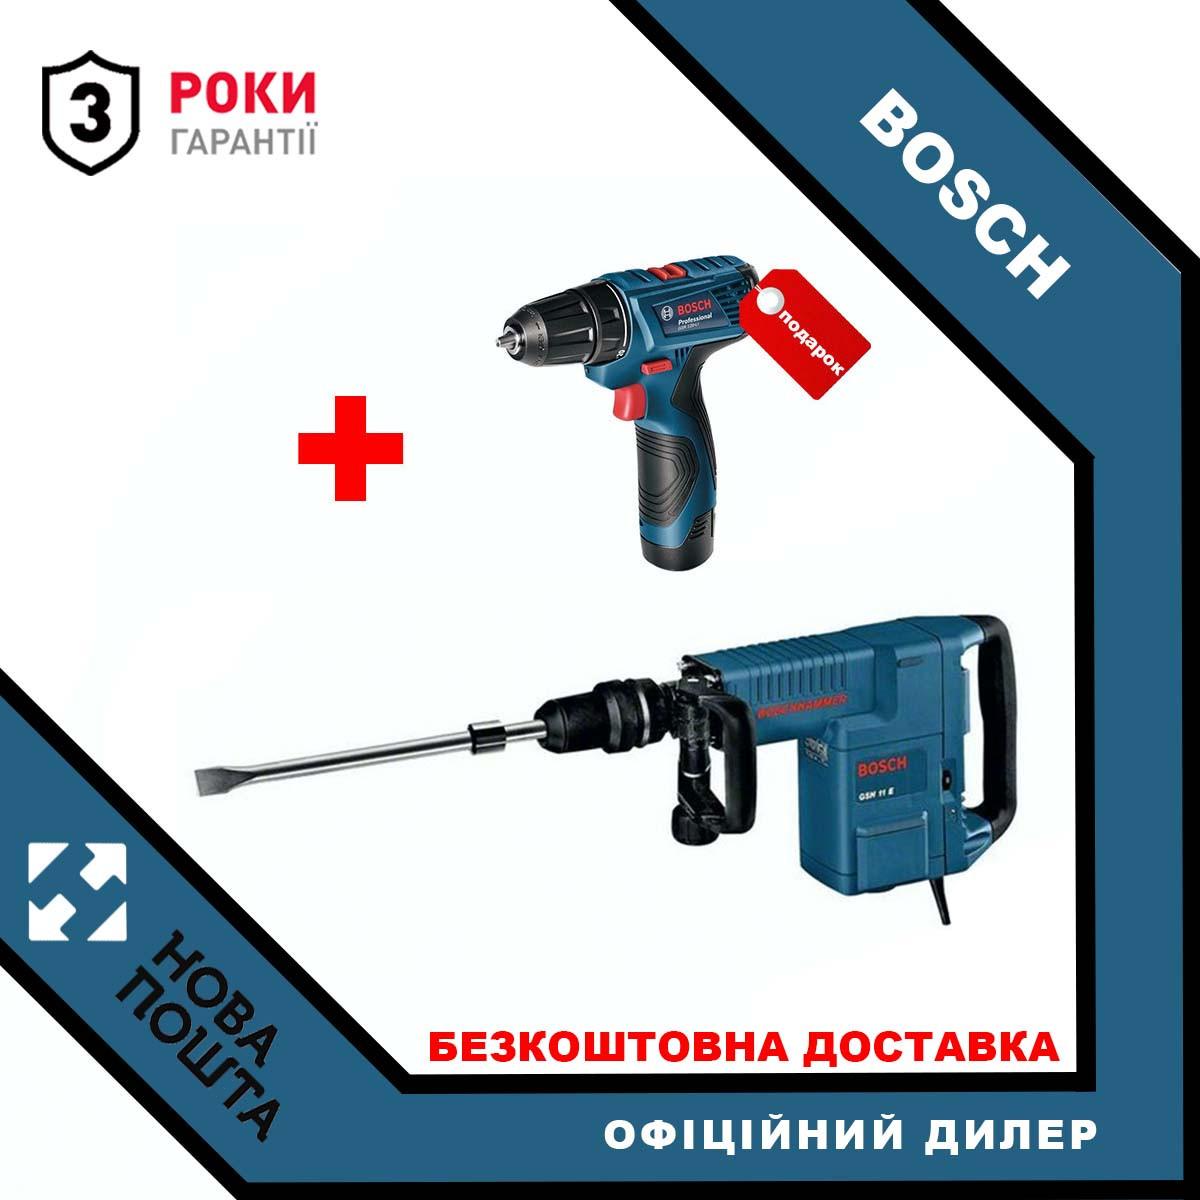 Молоток отбойный Bosch GSH 11 E (0611316708)